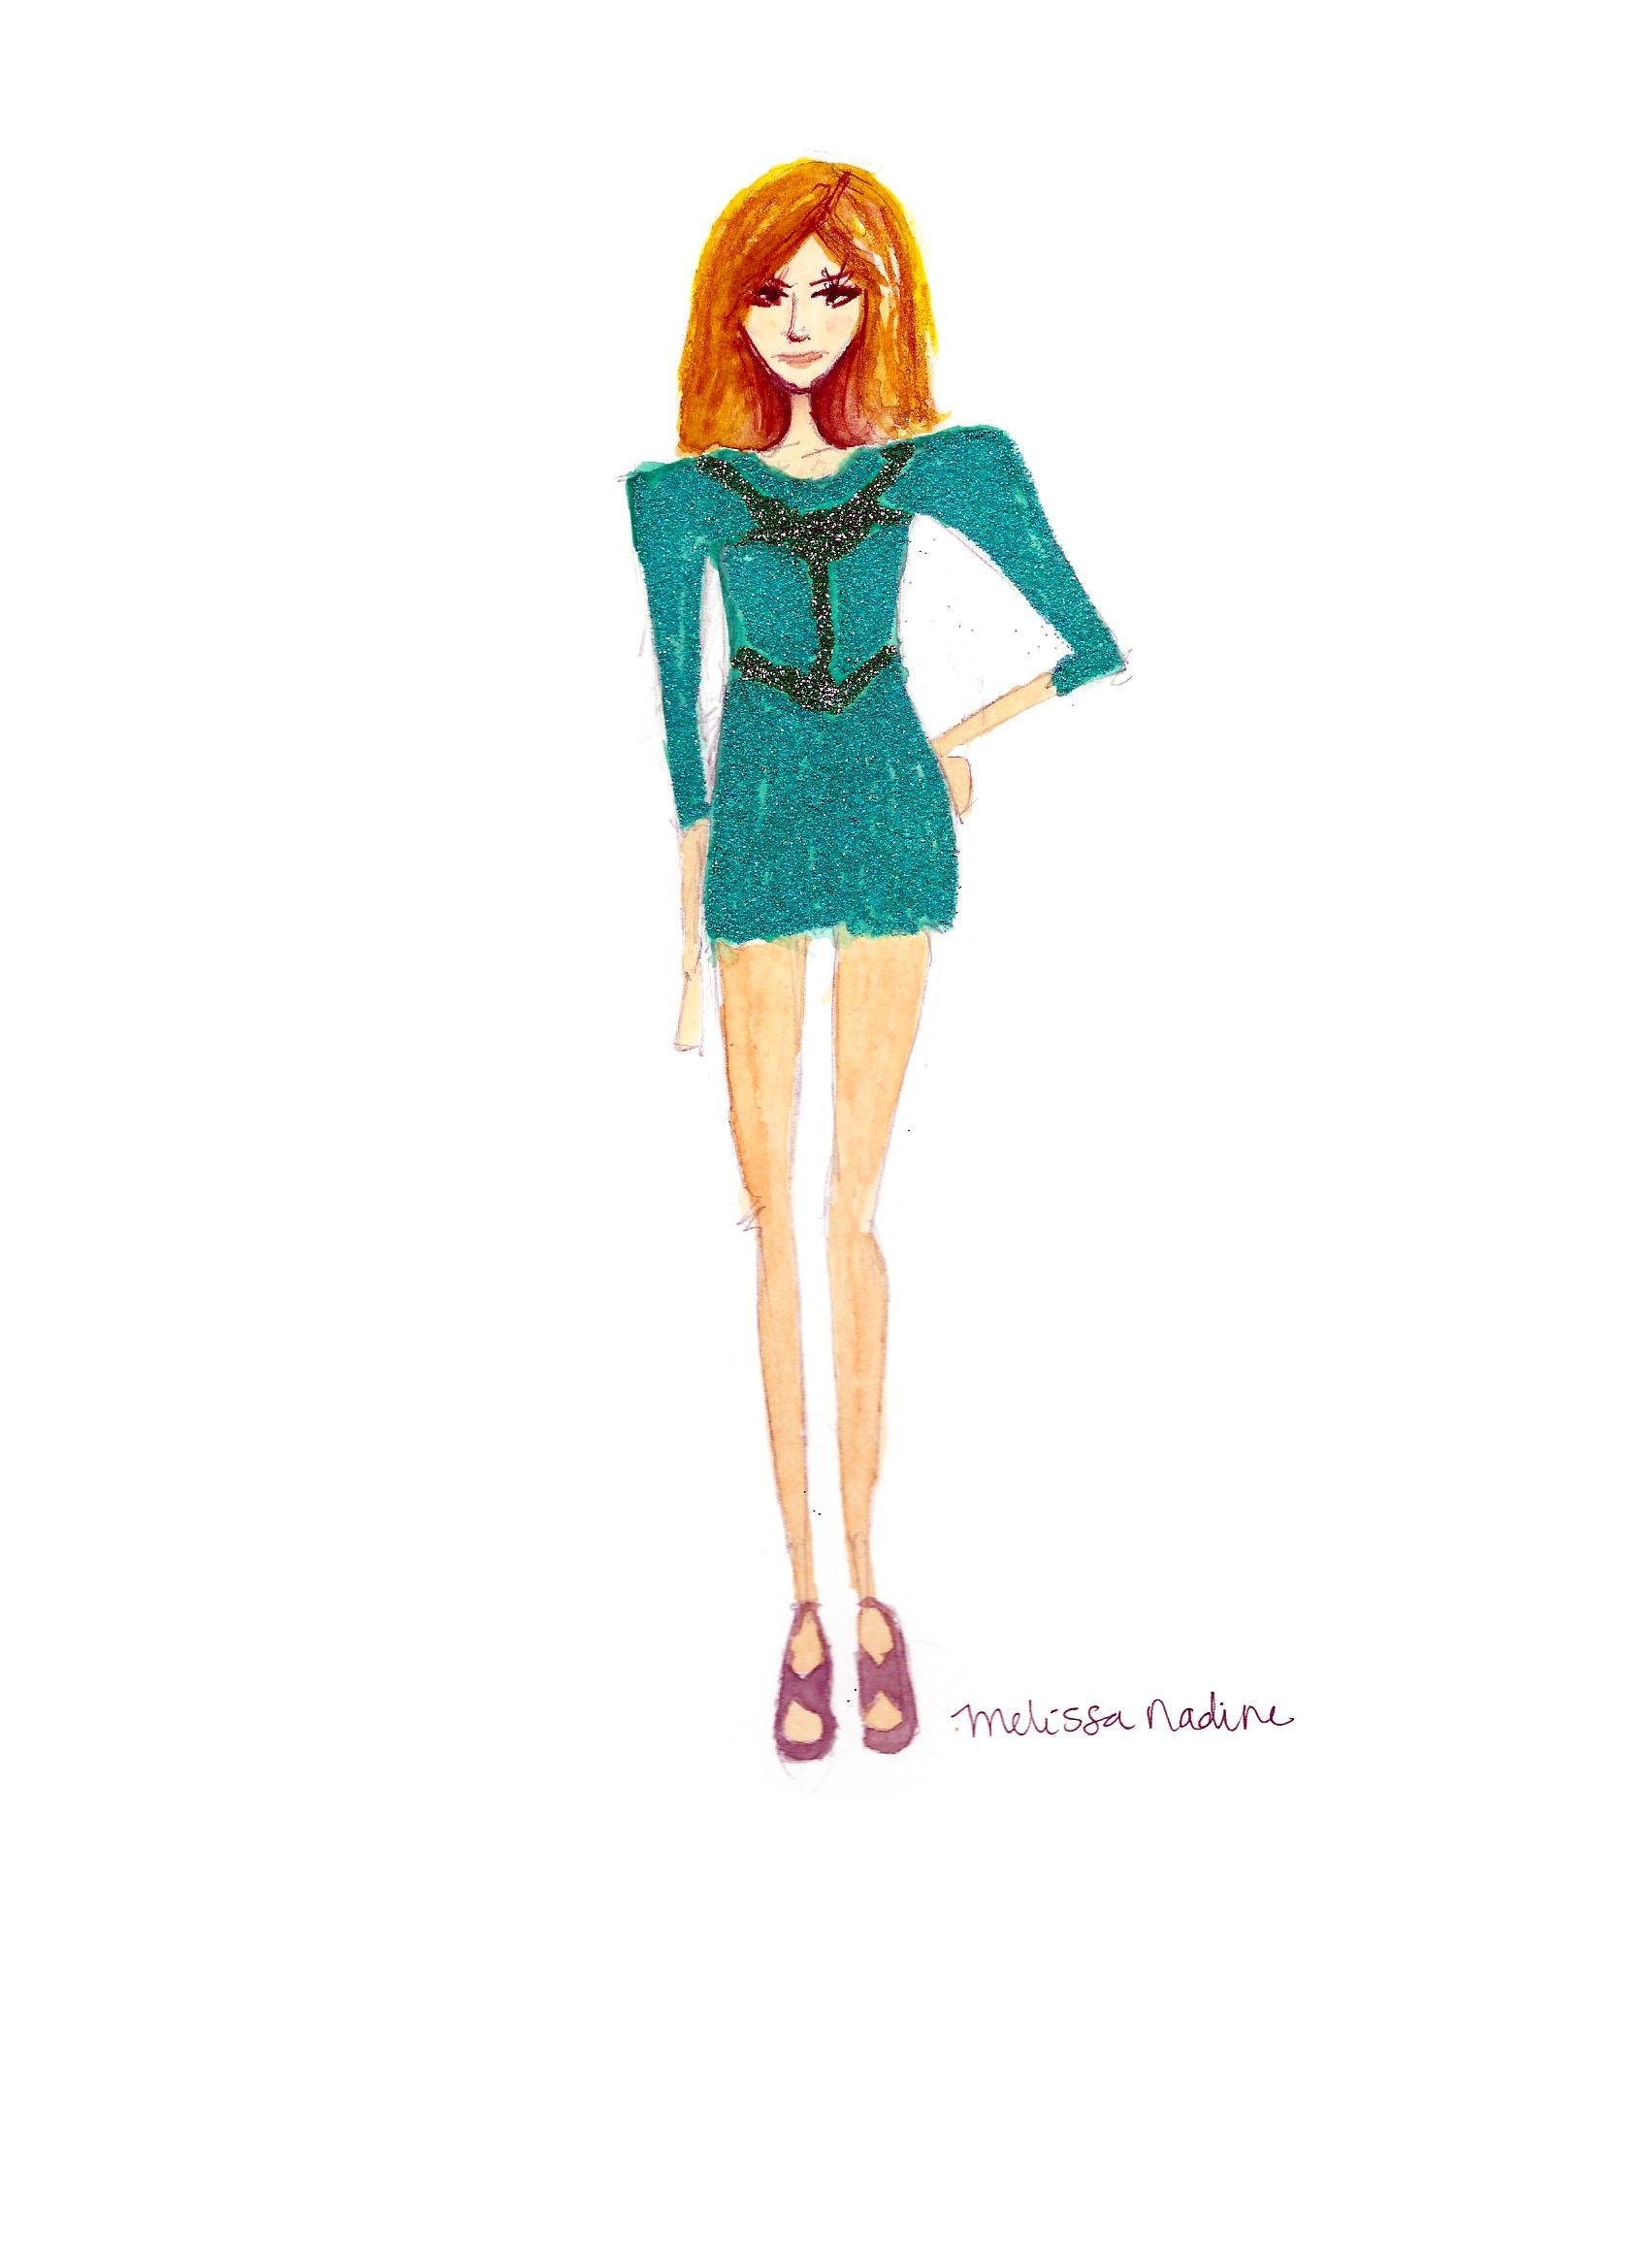 FINAL embellishment/watercolor Melissa Nadine fashion illustration - image 10 - student project